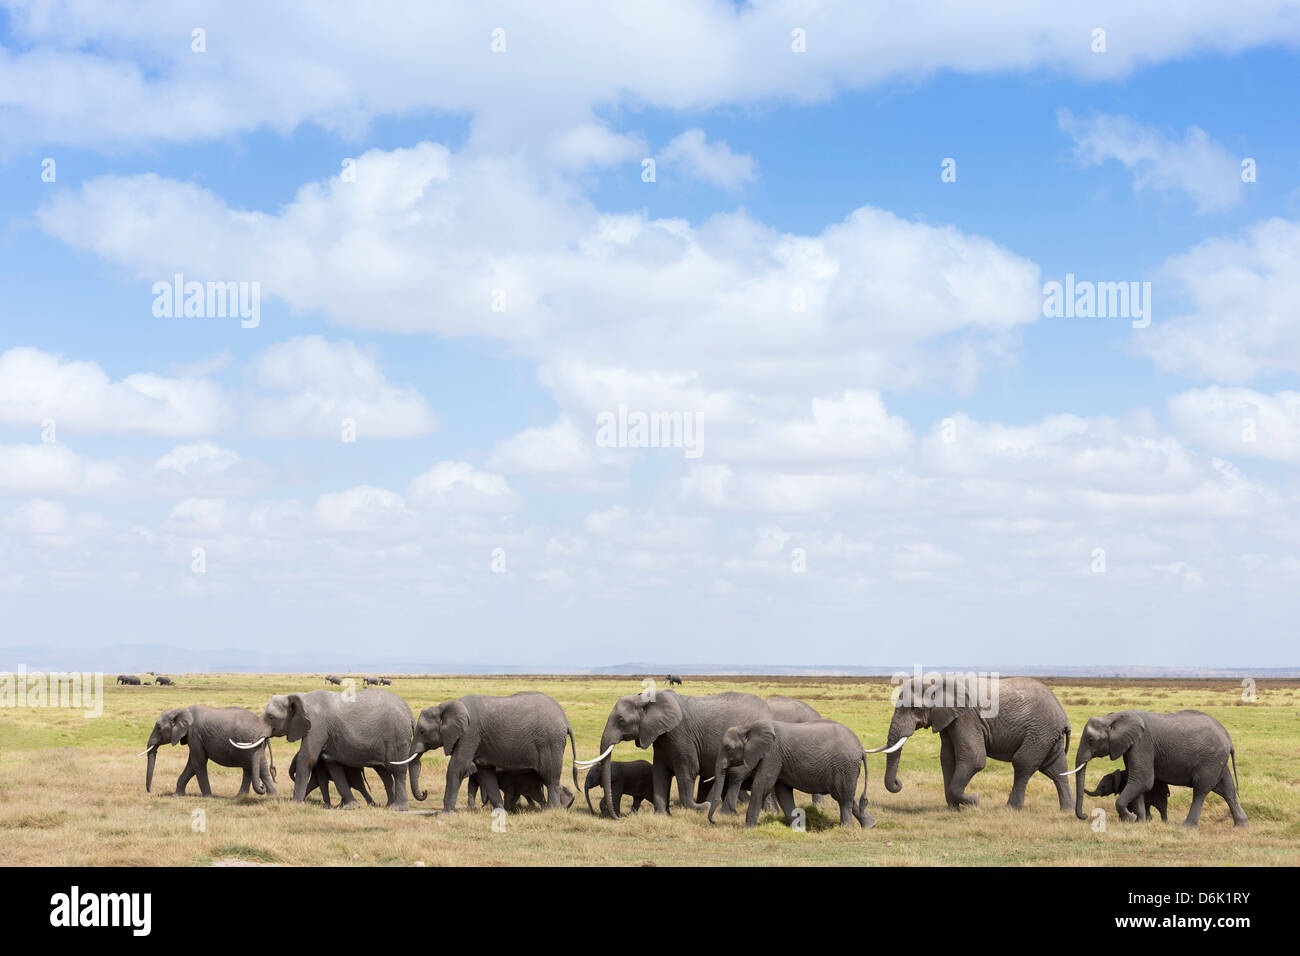 African elephants (Loxodonta africana), Amboseli National Park, Kenya, East Africa, Africa - Stock Image